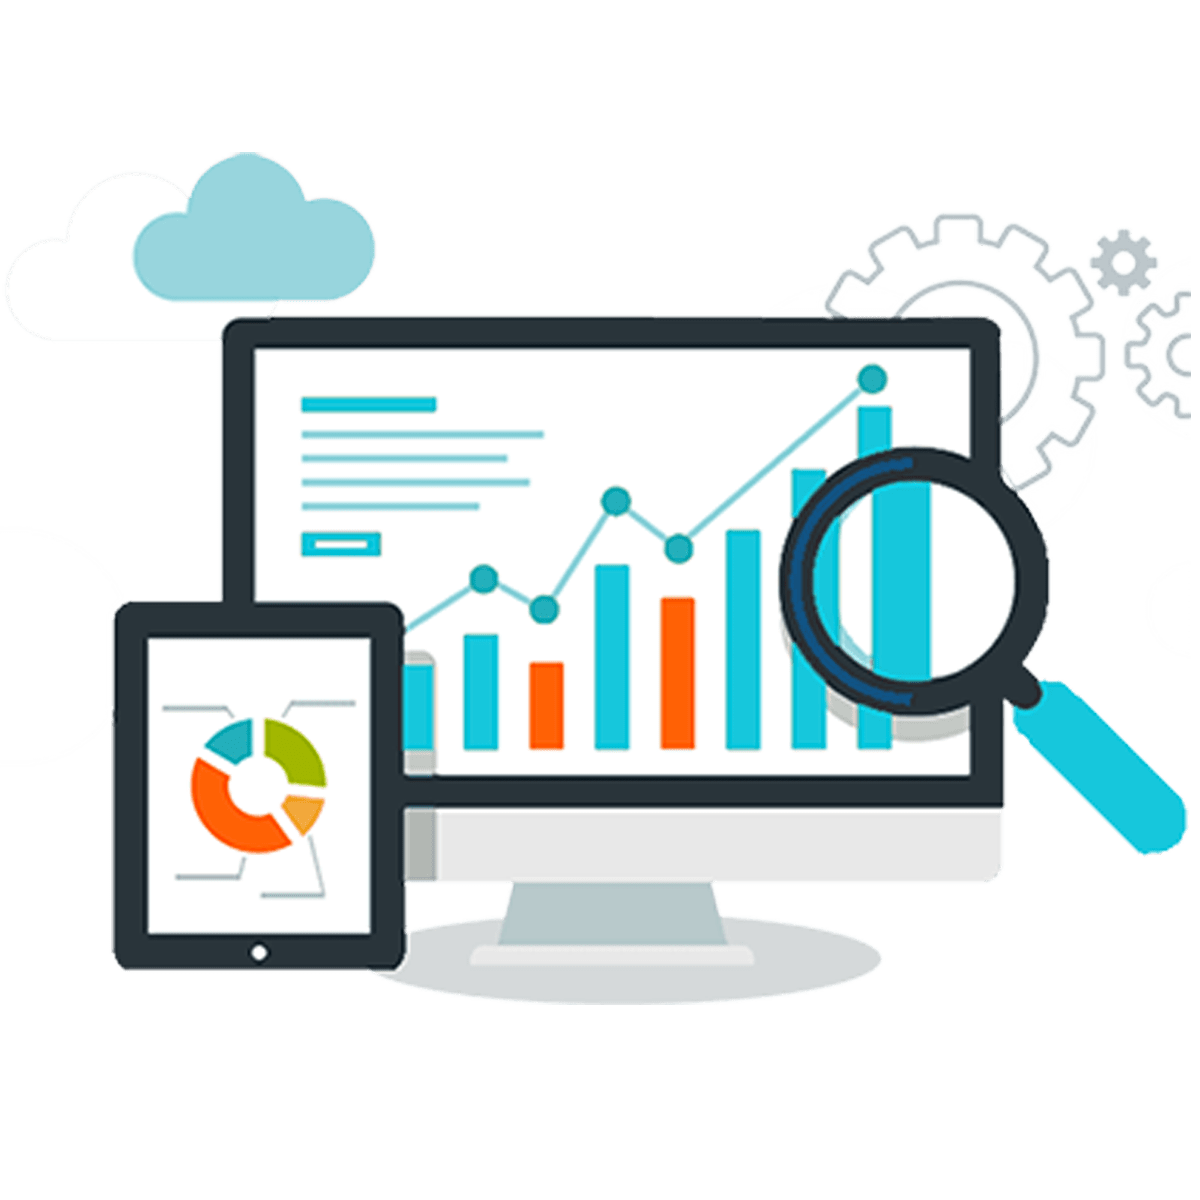 https://seoyakshaa.com/wp-content/uploads/2018/09/kisspng-web-development-search-engine-optimization-digital-seo-analytics-5af1359fbffd61.9354773015257573437864.png